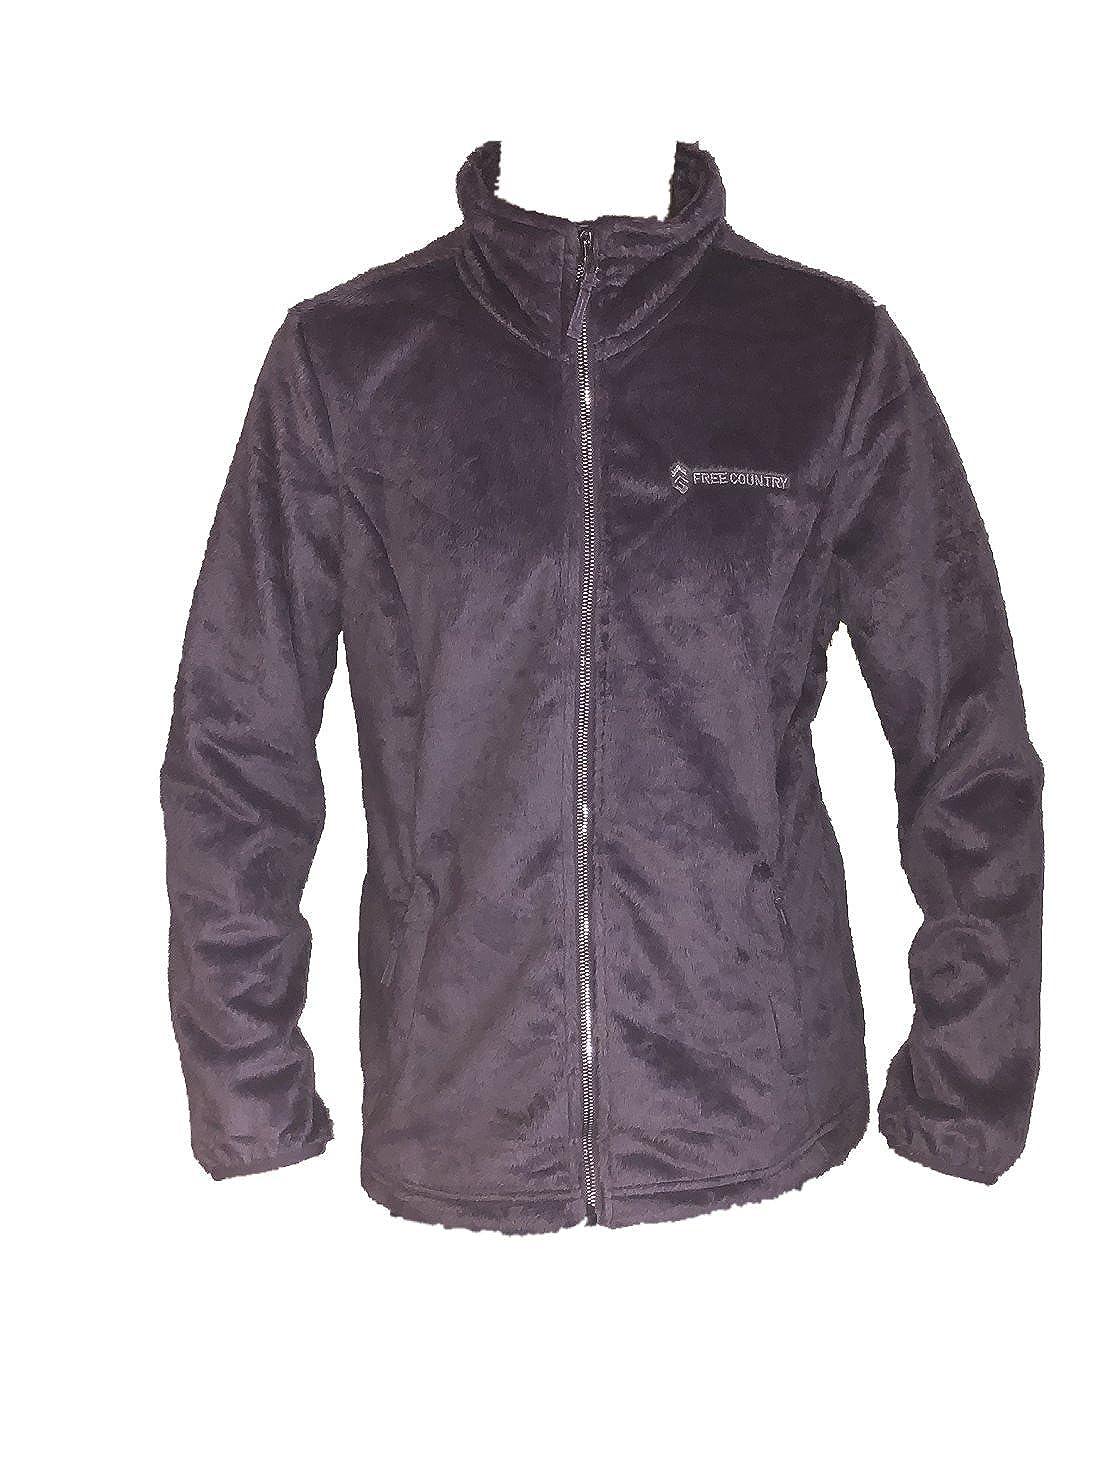 b2fdbec477ac Free Country Women s Butter Pile Fleece Full Zip Jacket (Medium ...